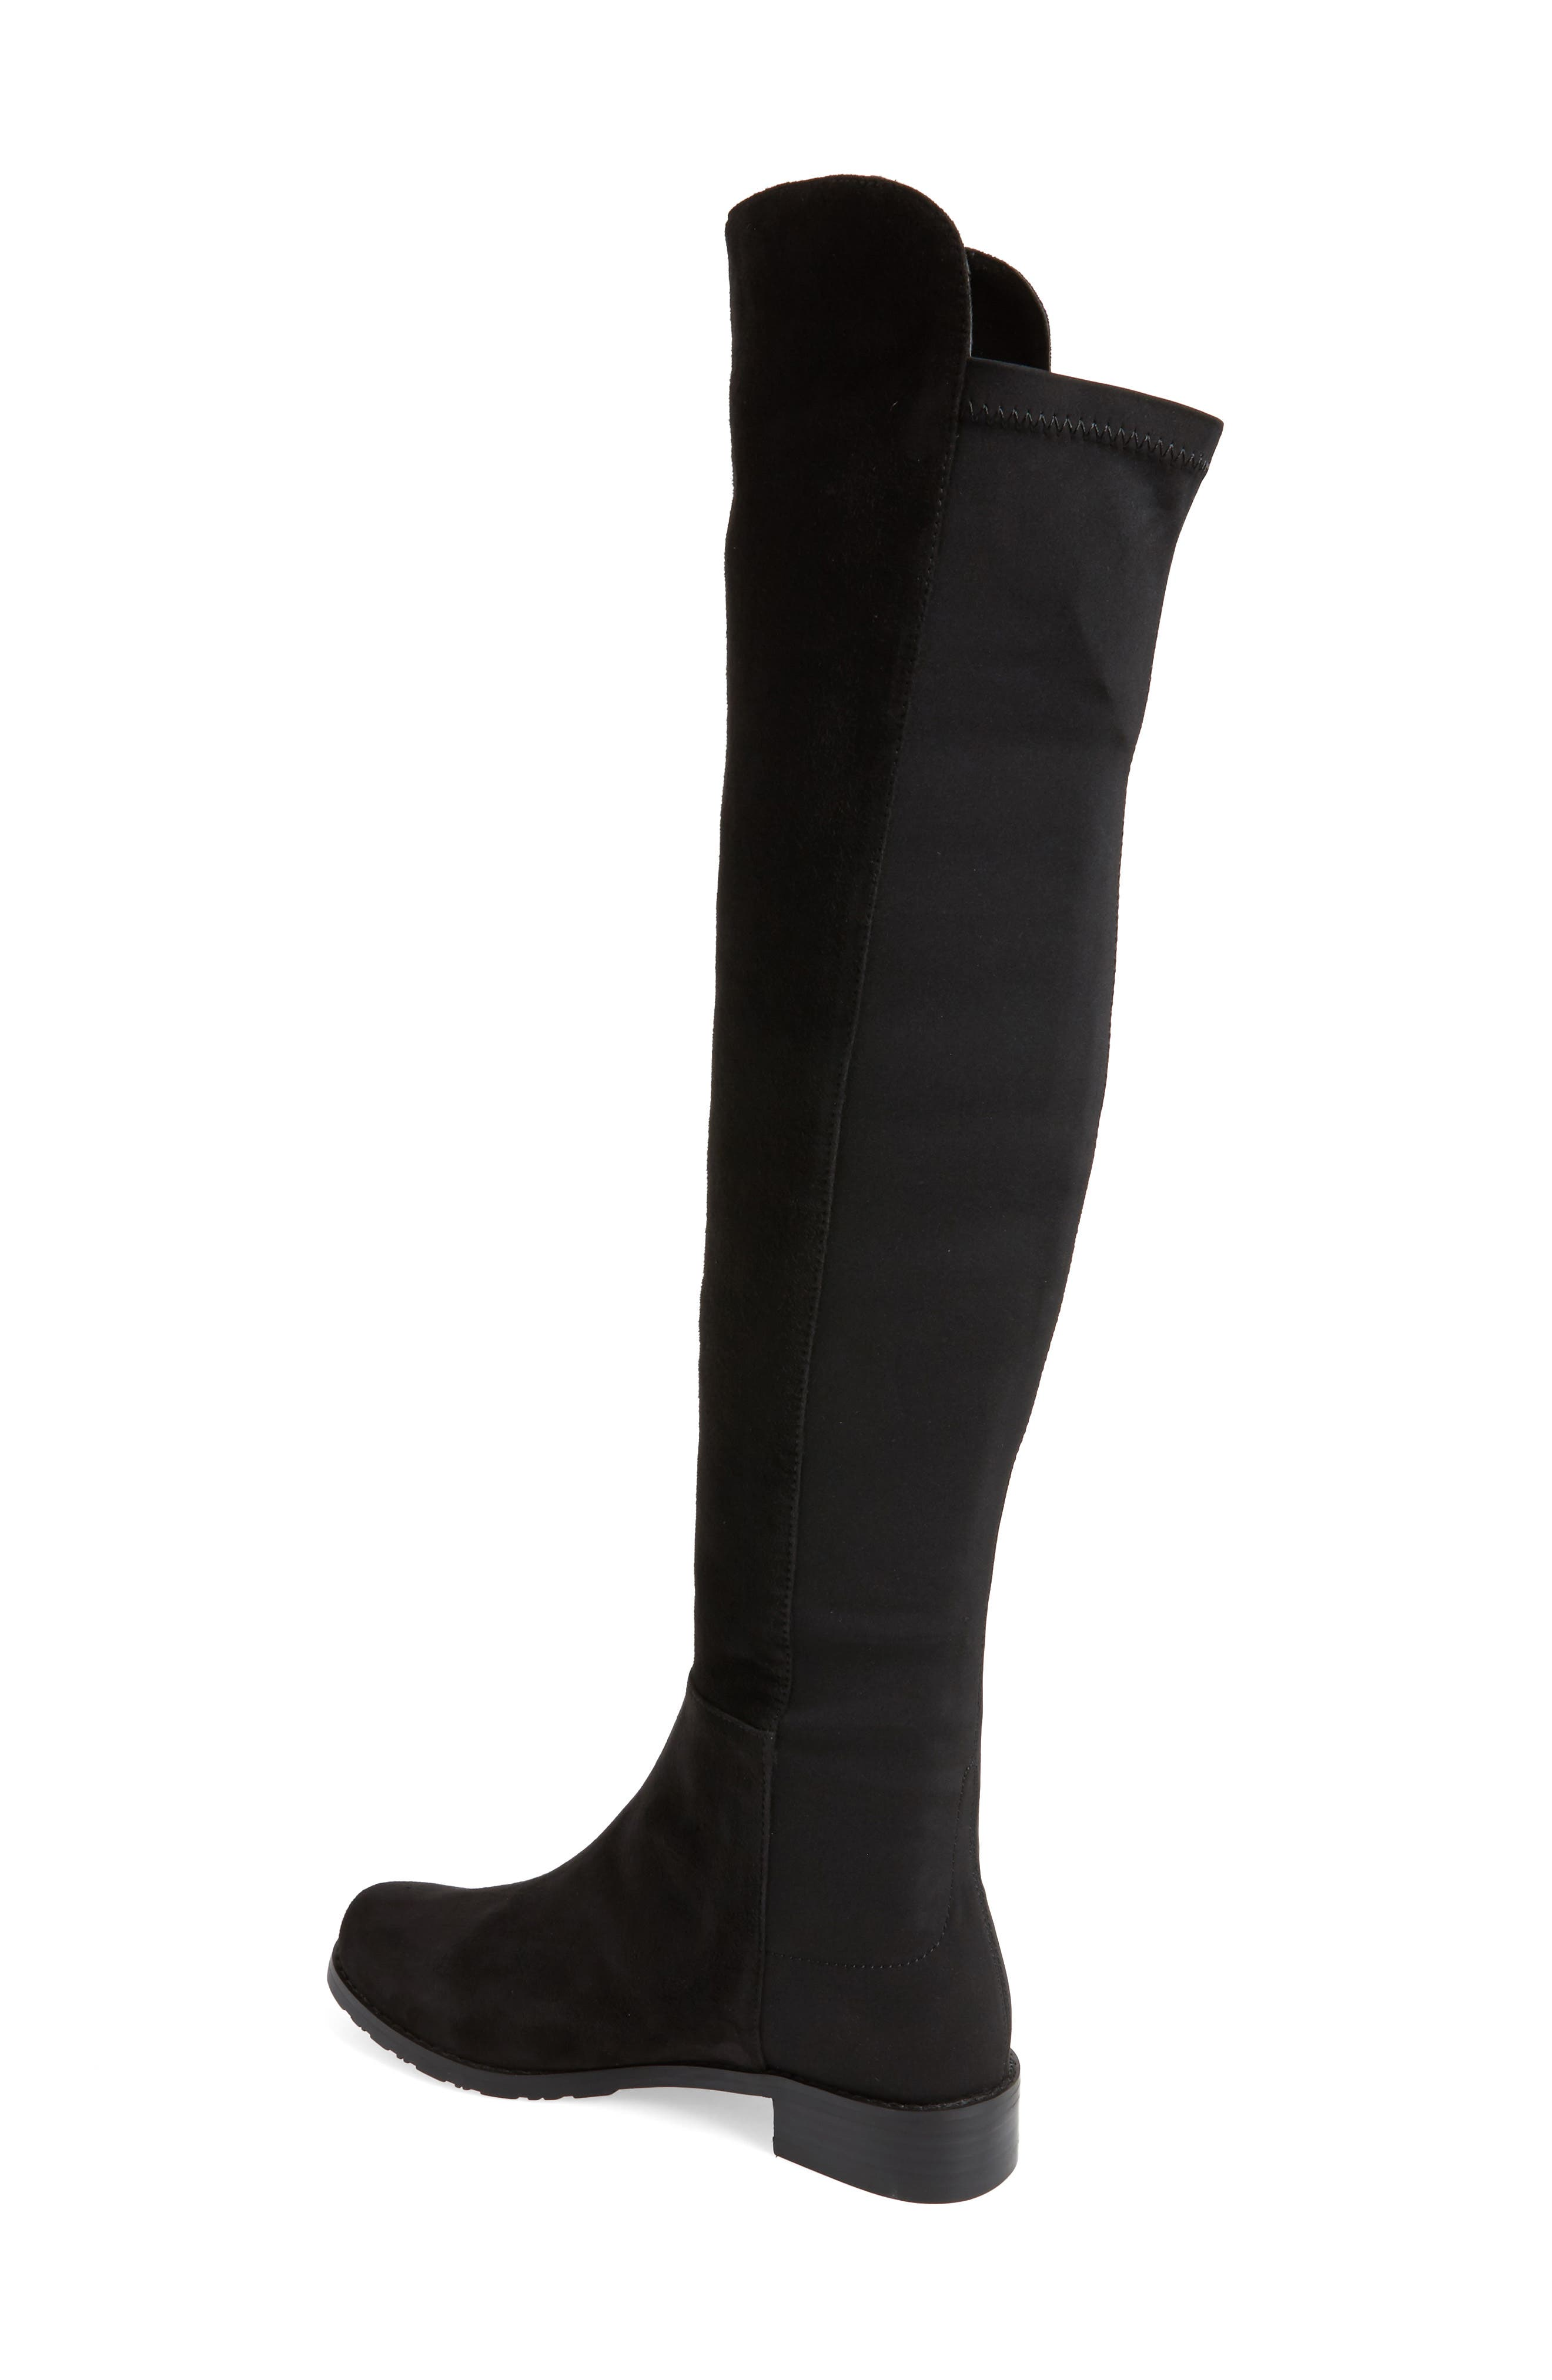 Panache Tall Boot,                             Alternate thumbnail 2, color,                             002